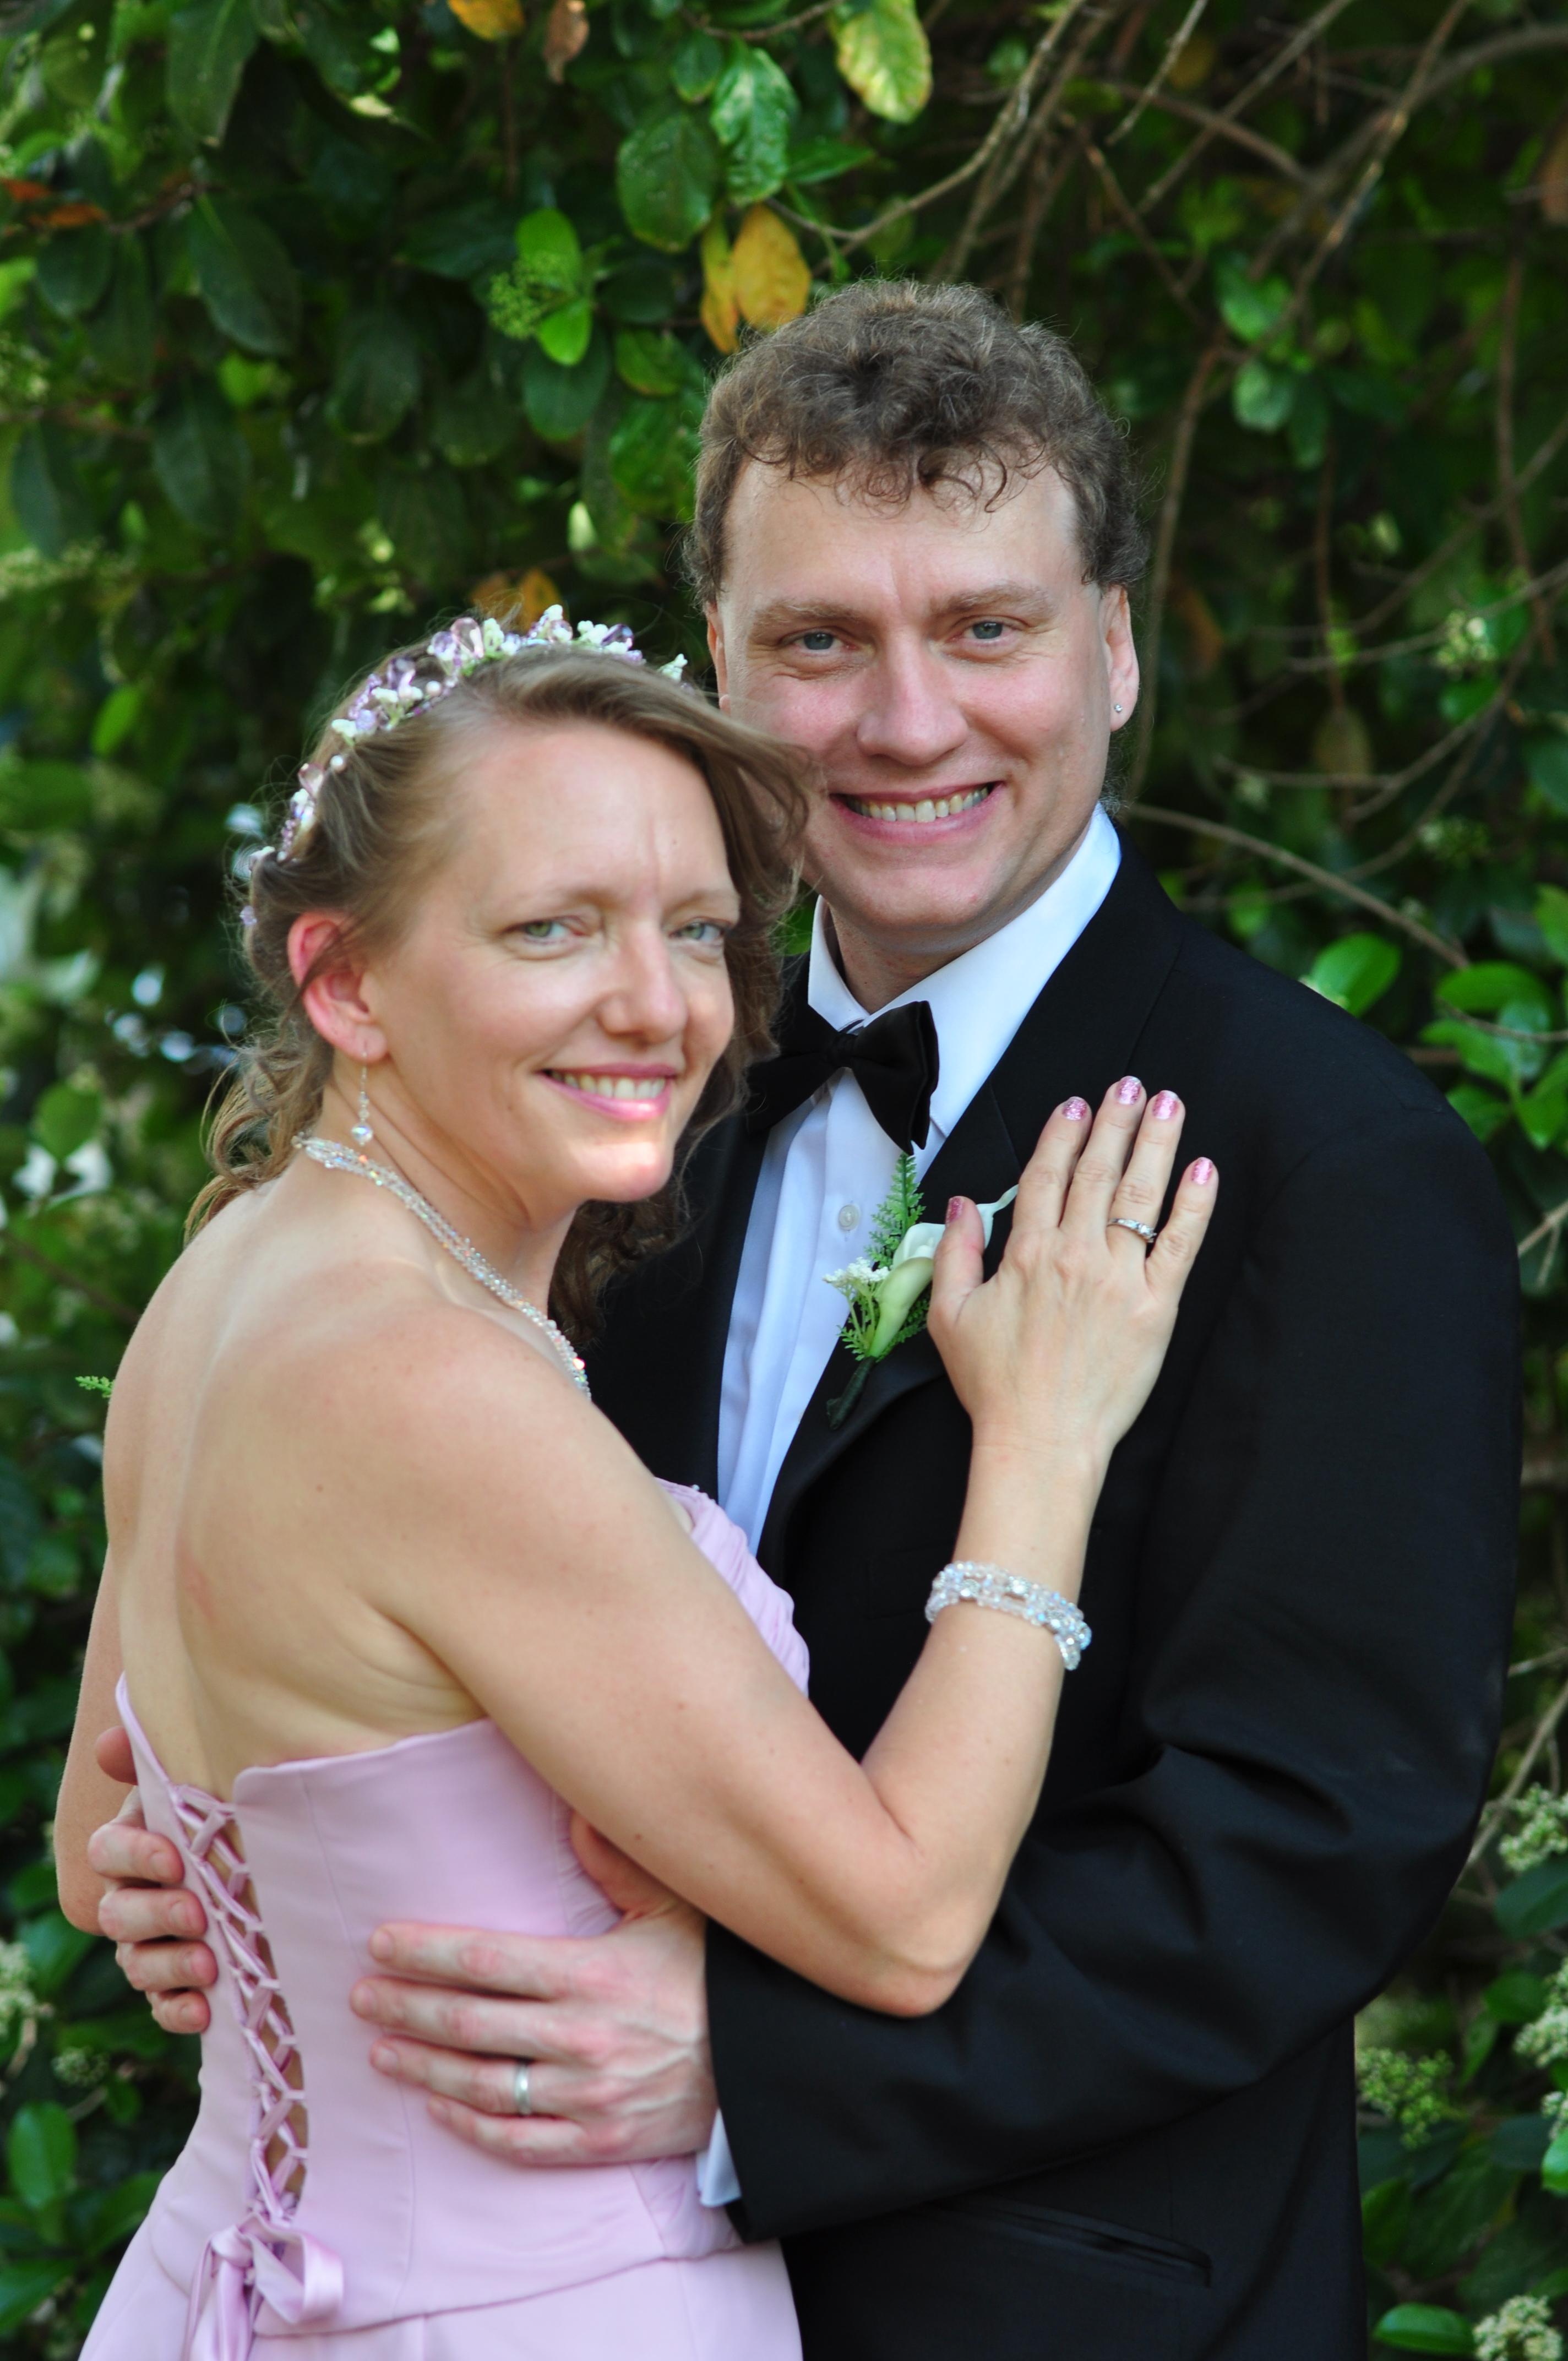 emily-and-travis-4-1-2013-april-fools-wedding-439